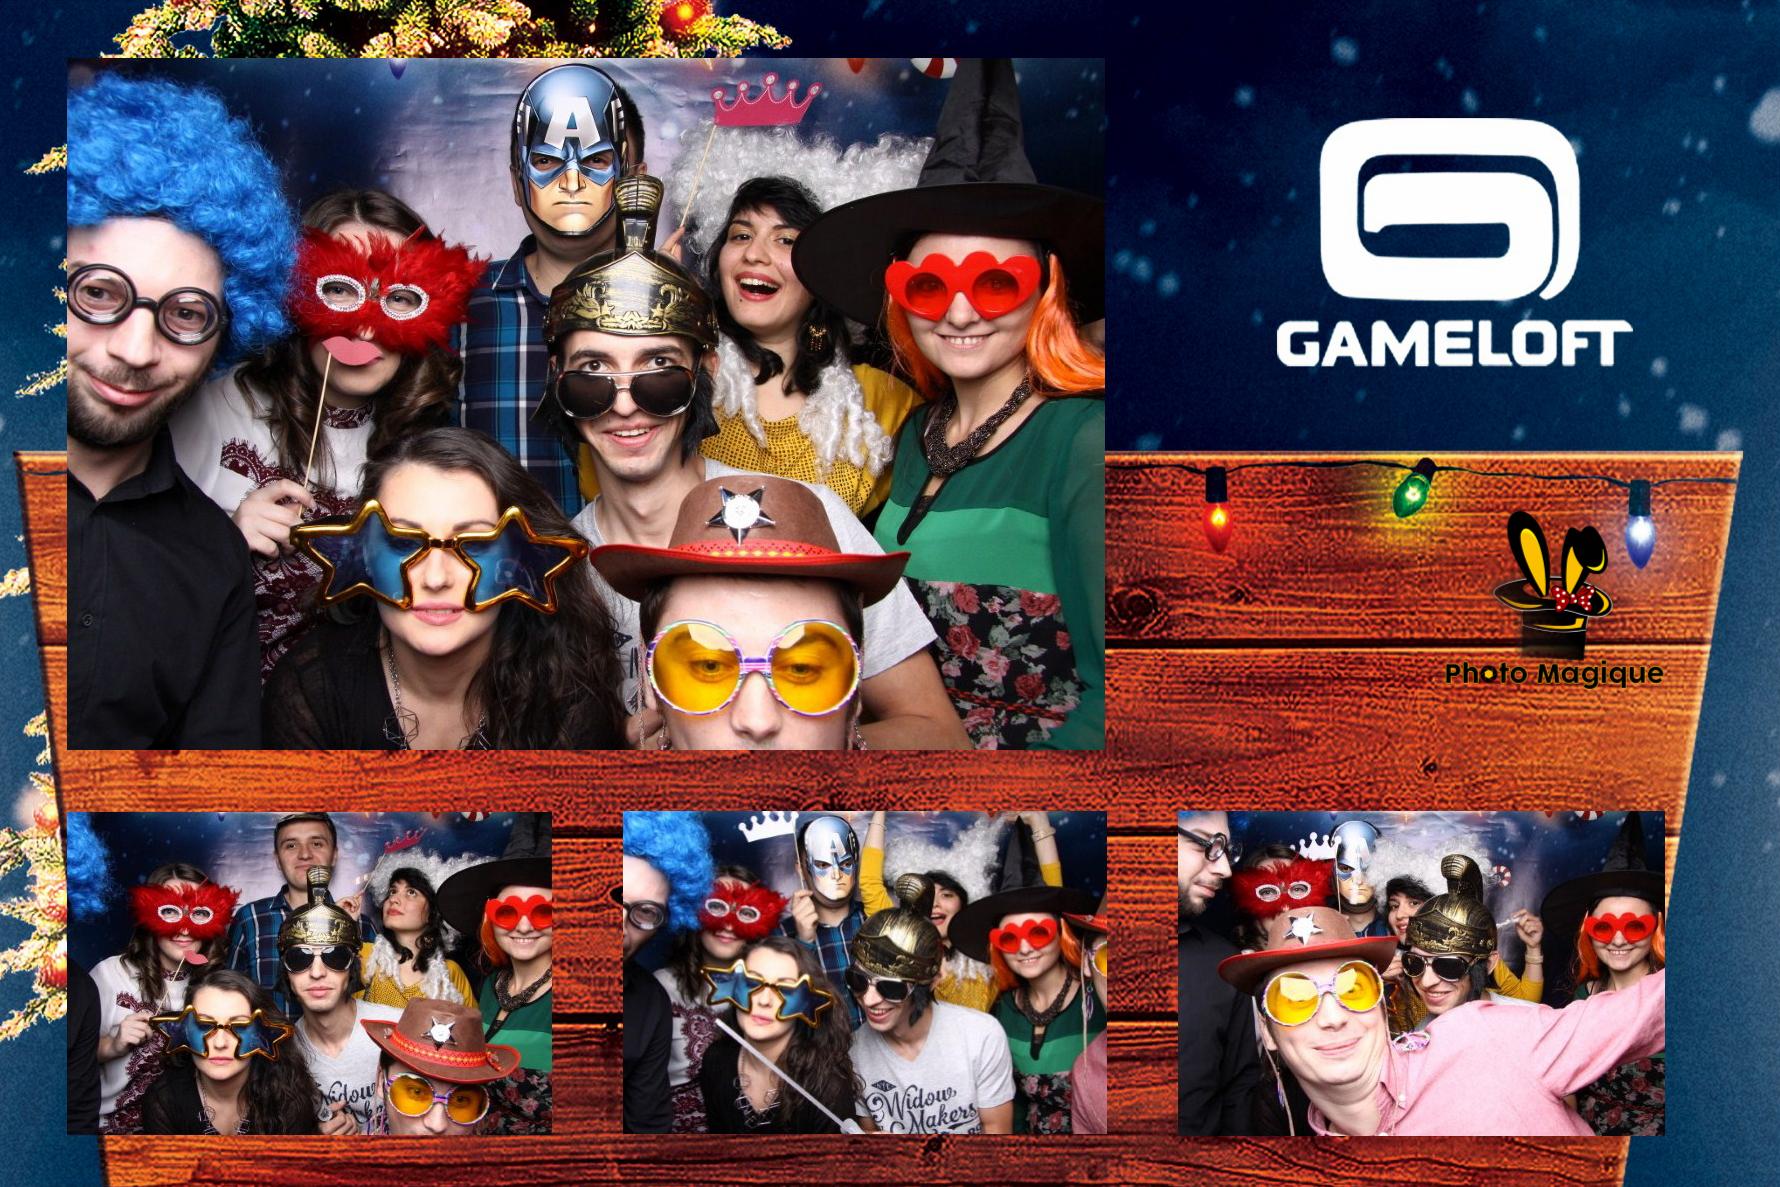 https://www.photomagique.ro/wp-content/uploads/2020/05/Gameloft.jpg